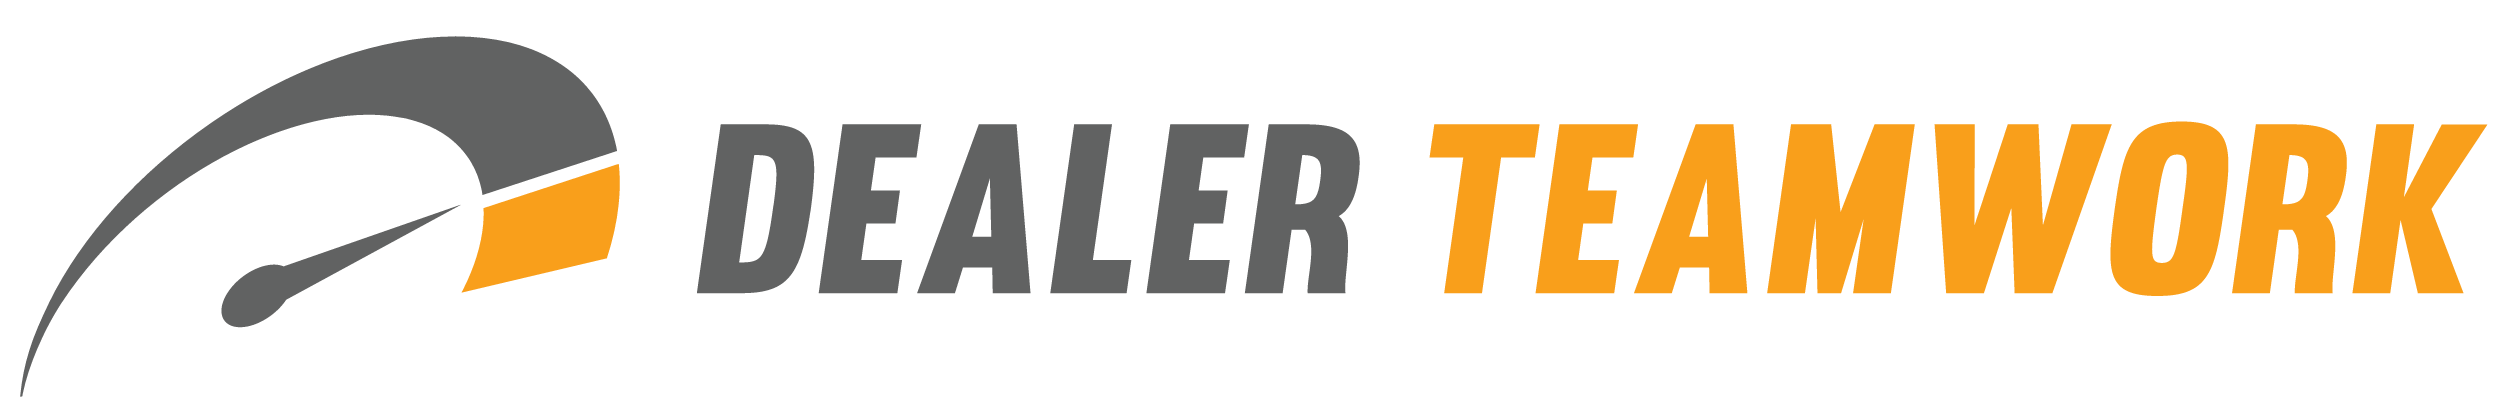 DealerTeamwork LLC Logo